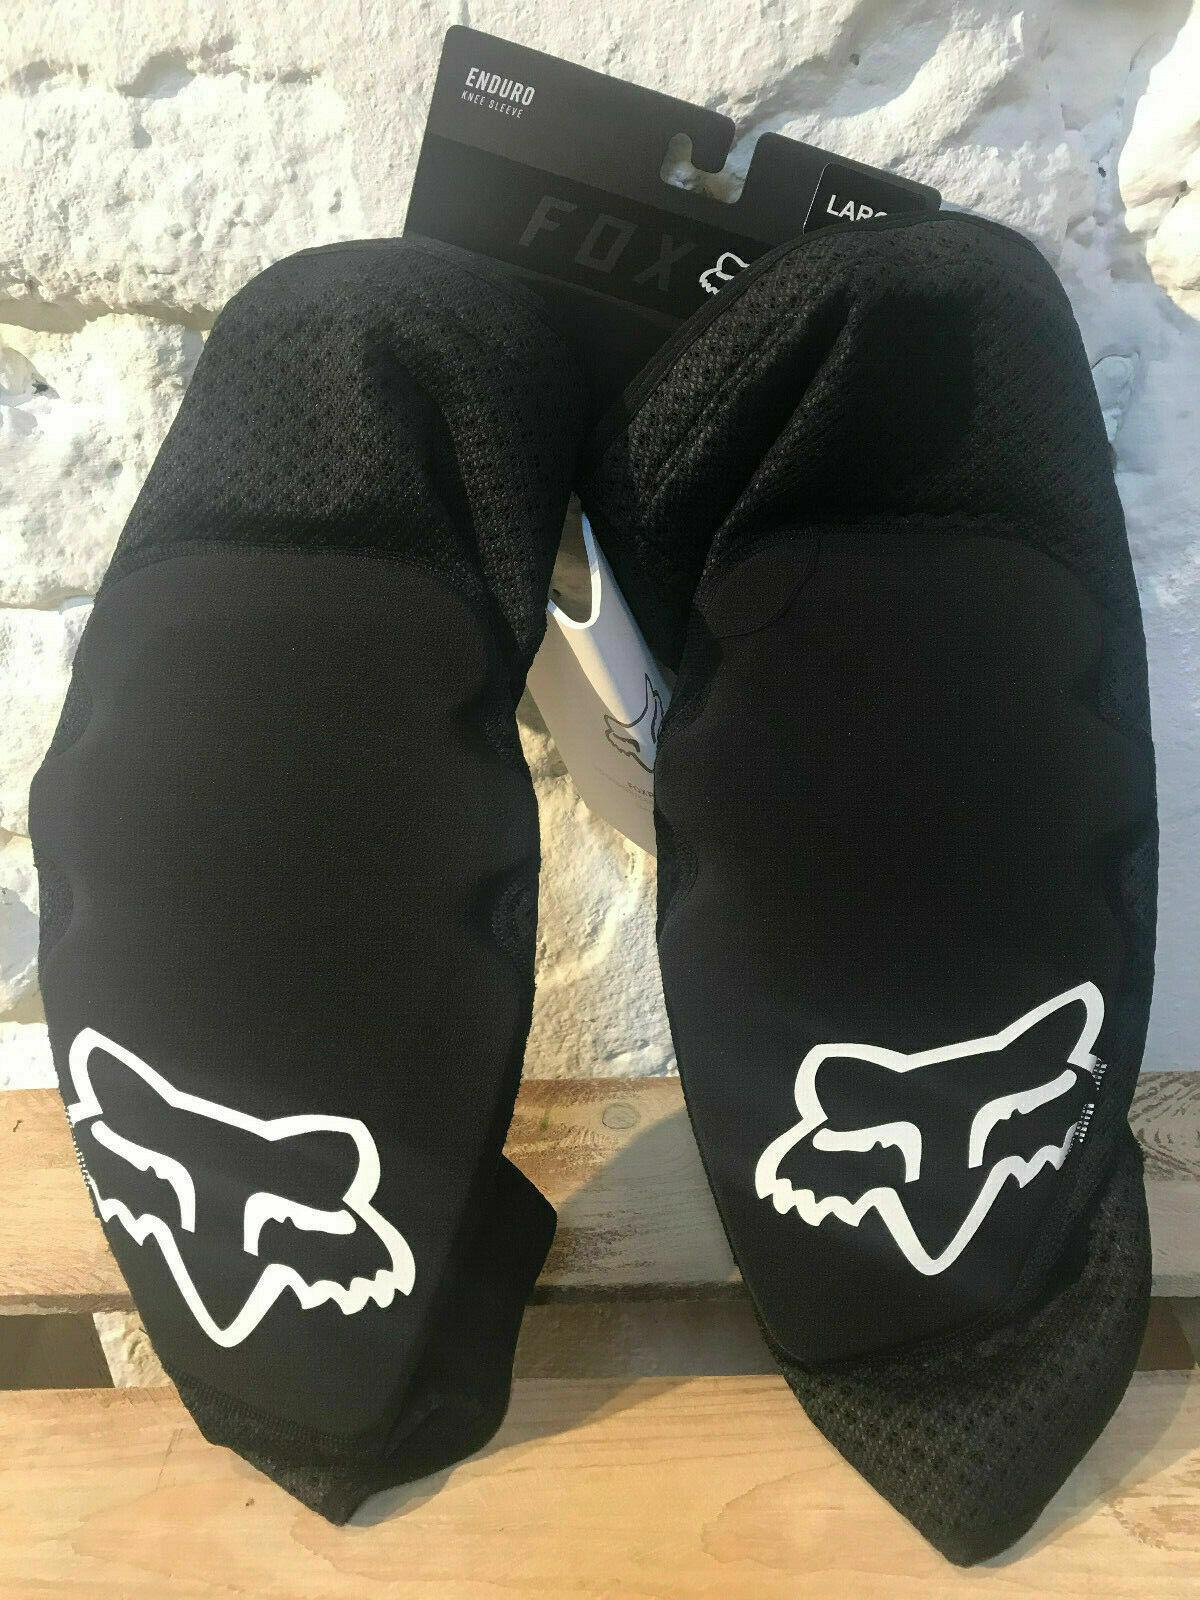 FOX Enduro Knee Sleeve Guard Knieschoner  Protektoren schwarz